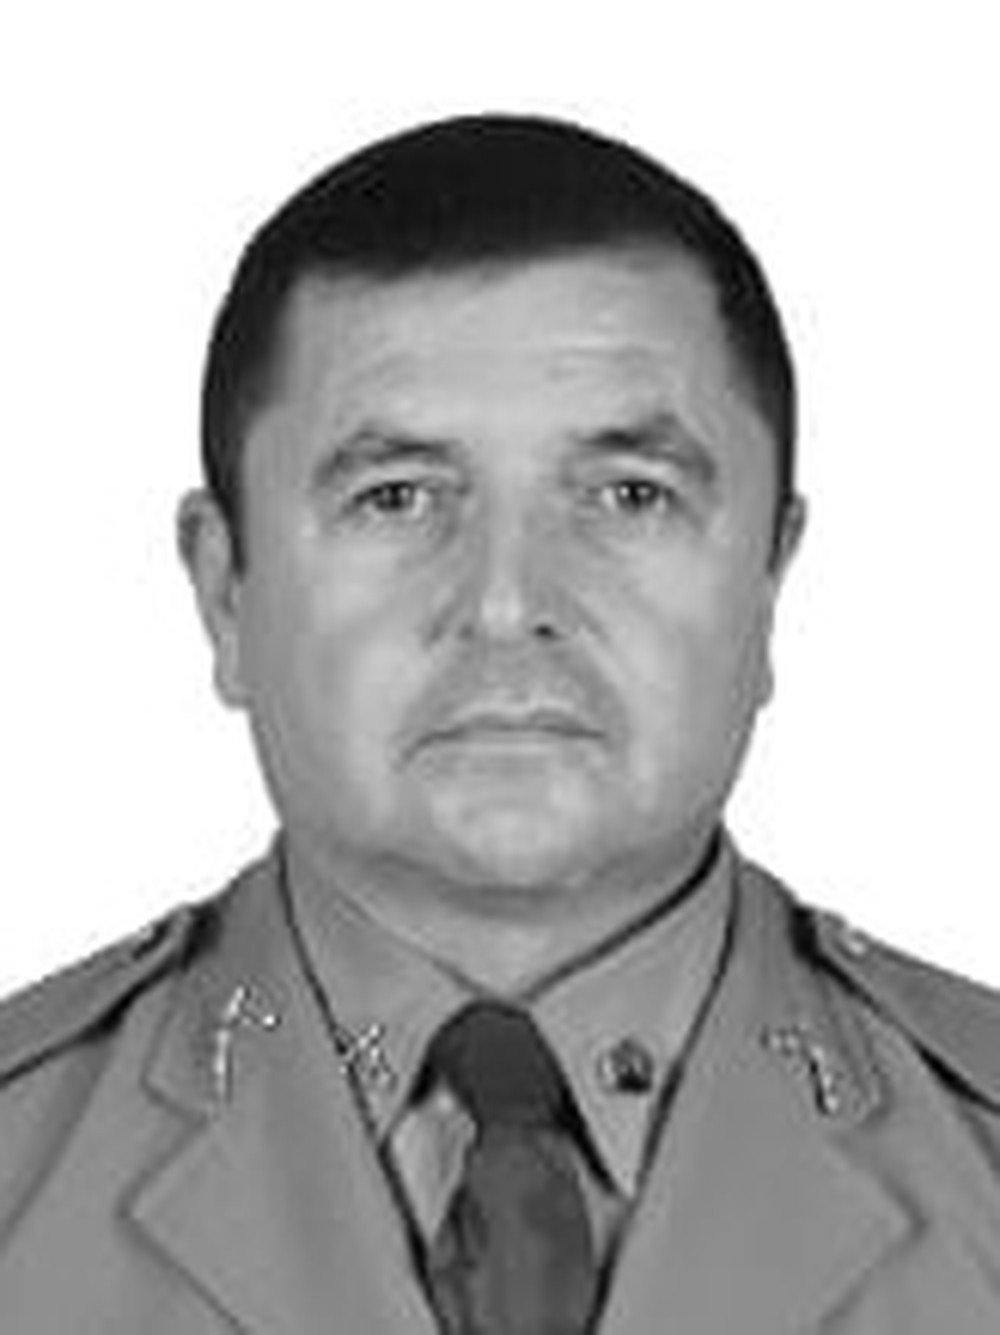 Sargento da PMTO morre aos 54 anos: é o primeiro militar da ativa vítima da Covid-19